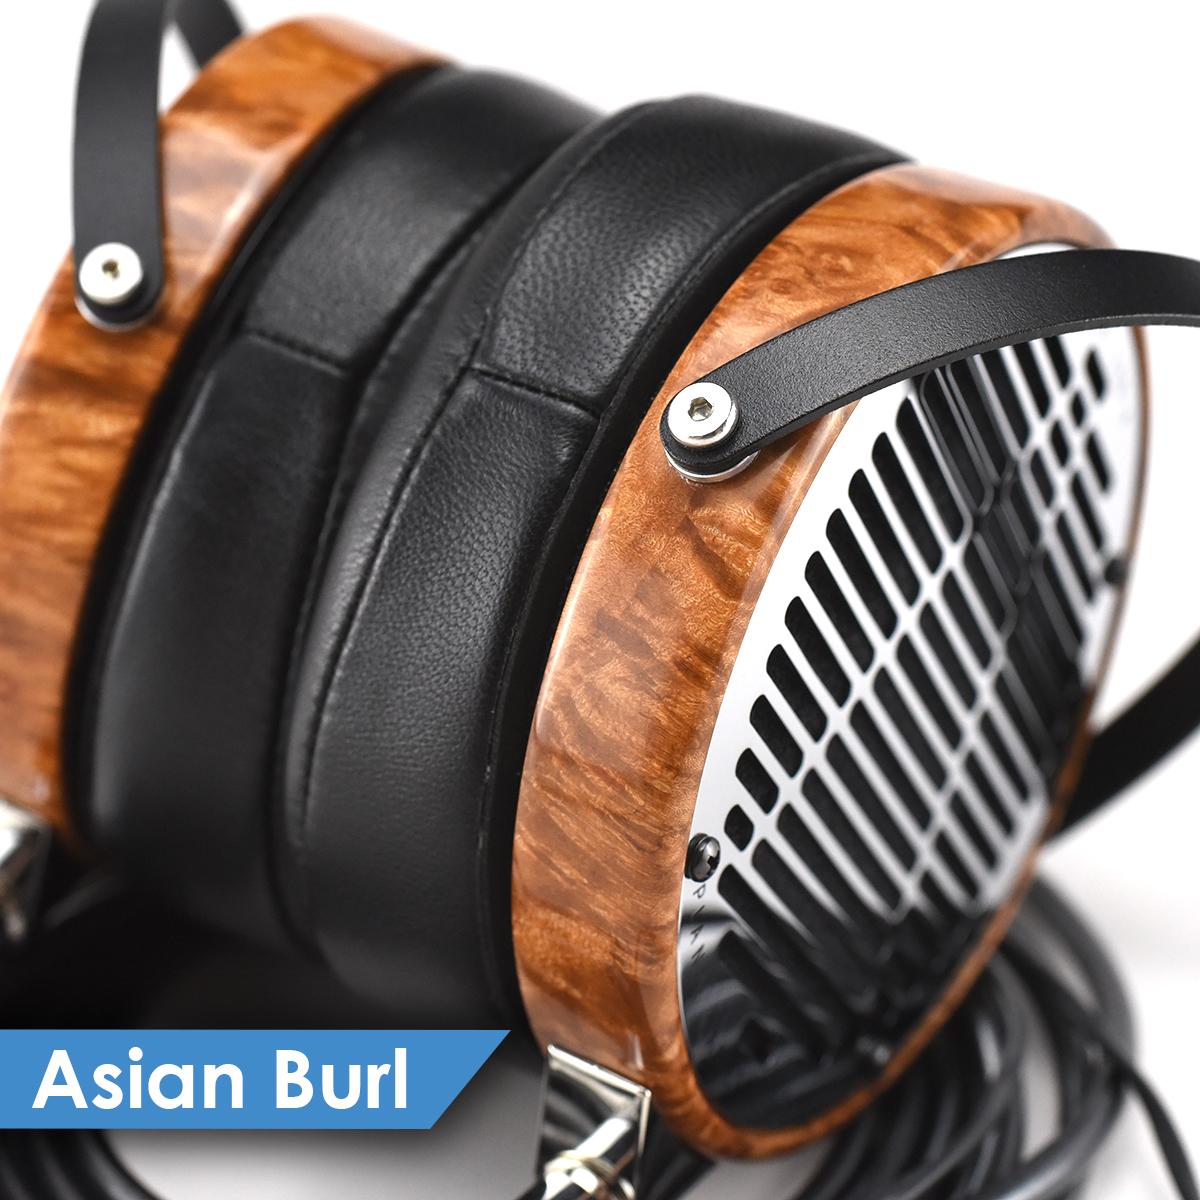 Audeze LCD-4 Asian-Burl